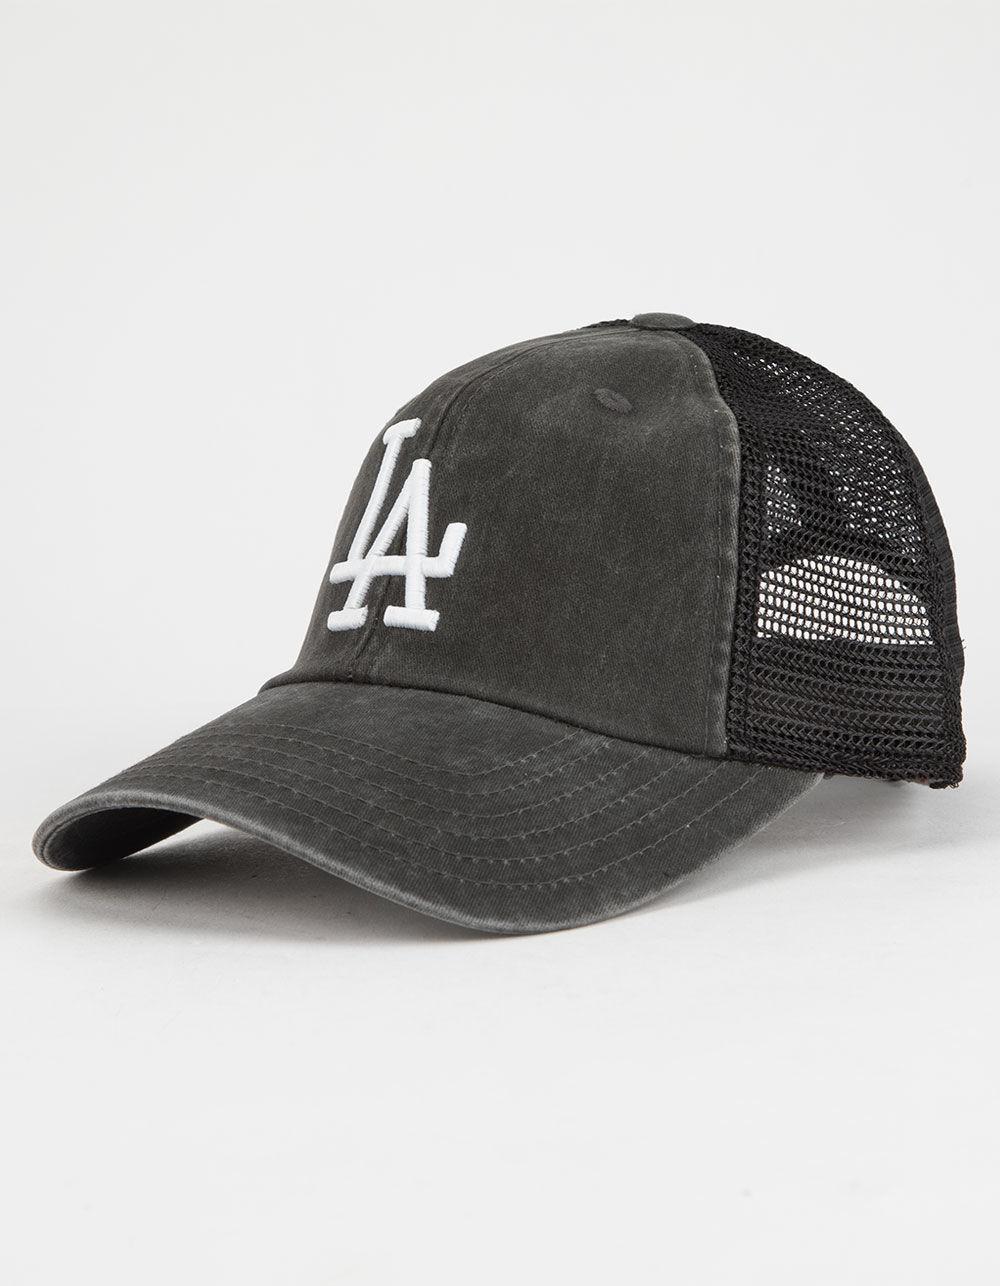 Lyst - American Needle Mlb Baseball La Dodgers Dad Hat in Black 02dfbd0825eb